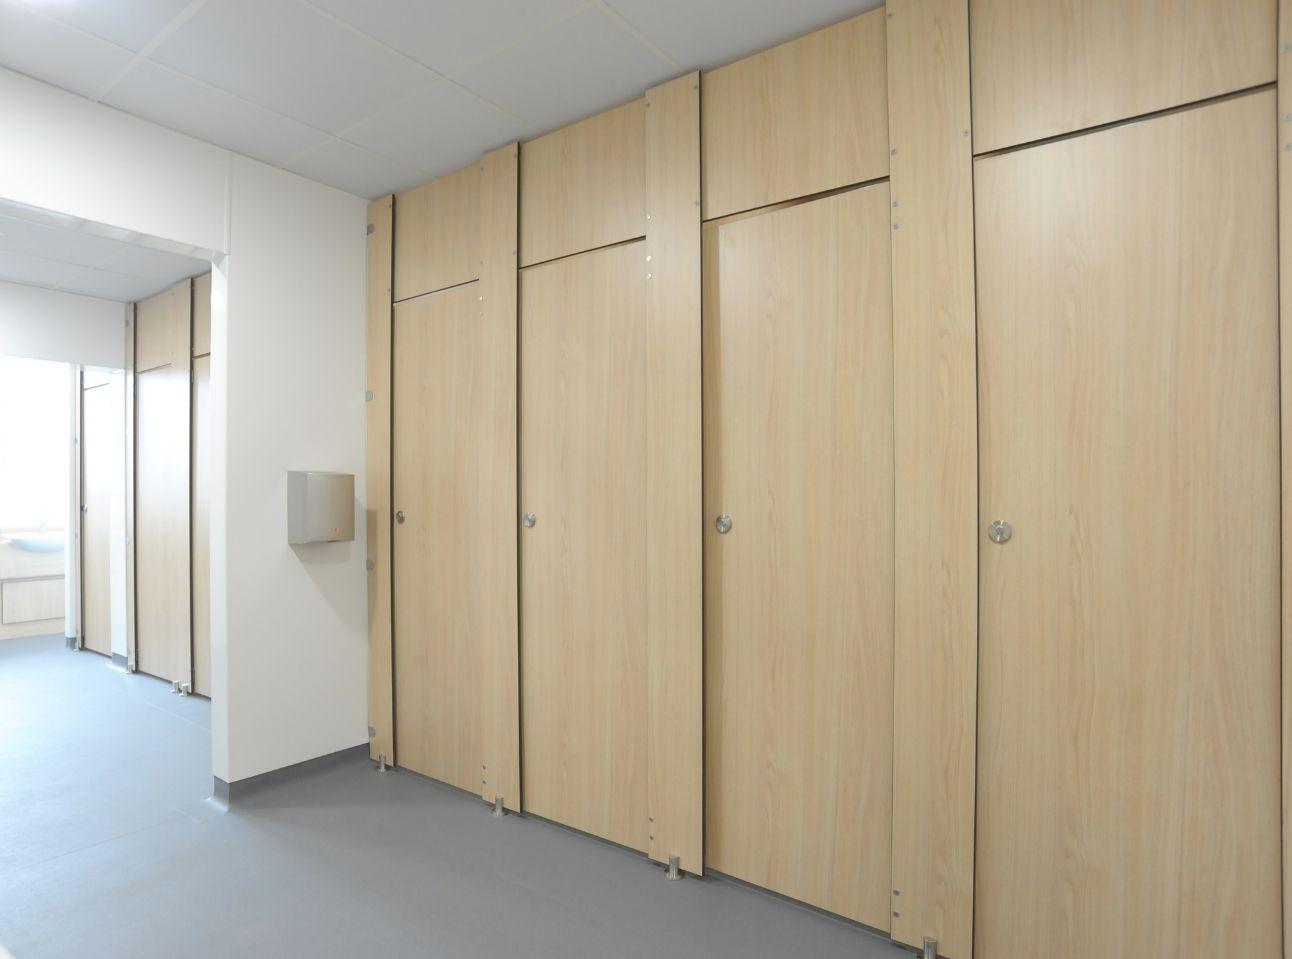 Ludlow Junior School Toilet Refurbishment | Case Study | Commercial Washrooms